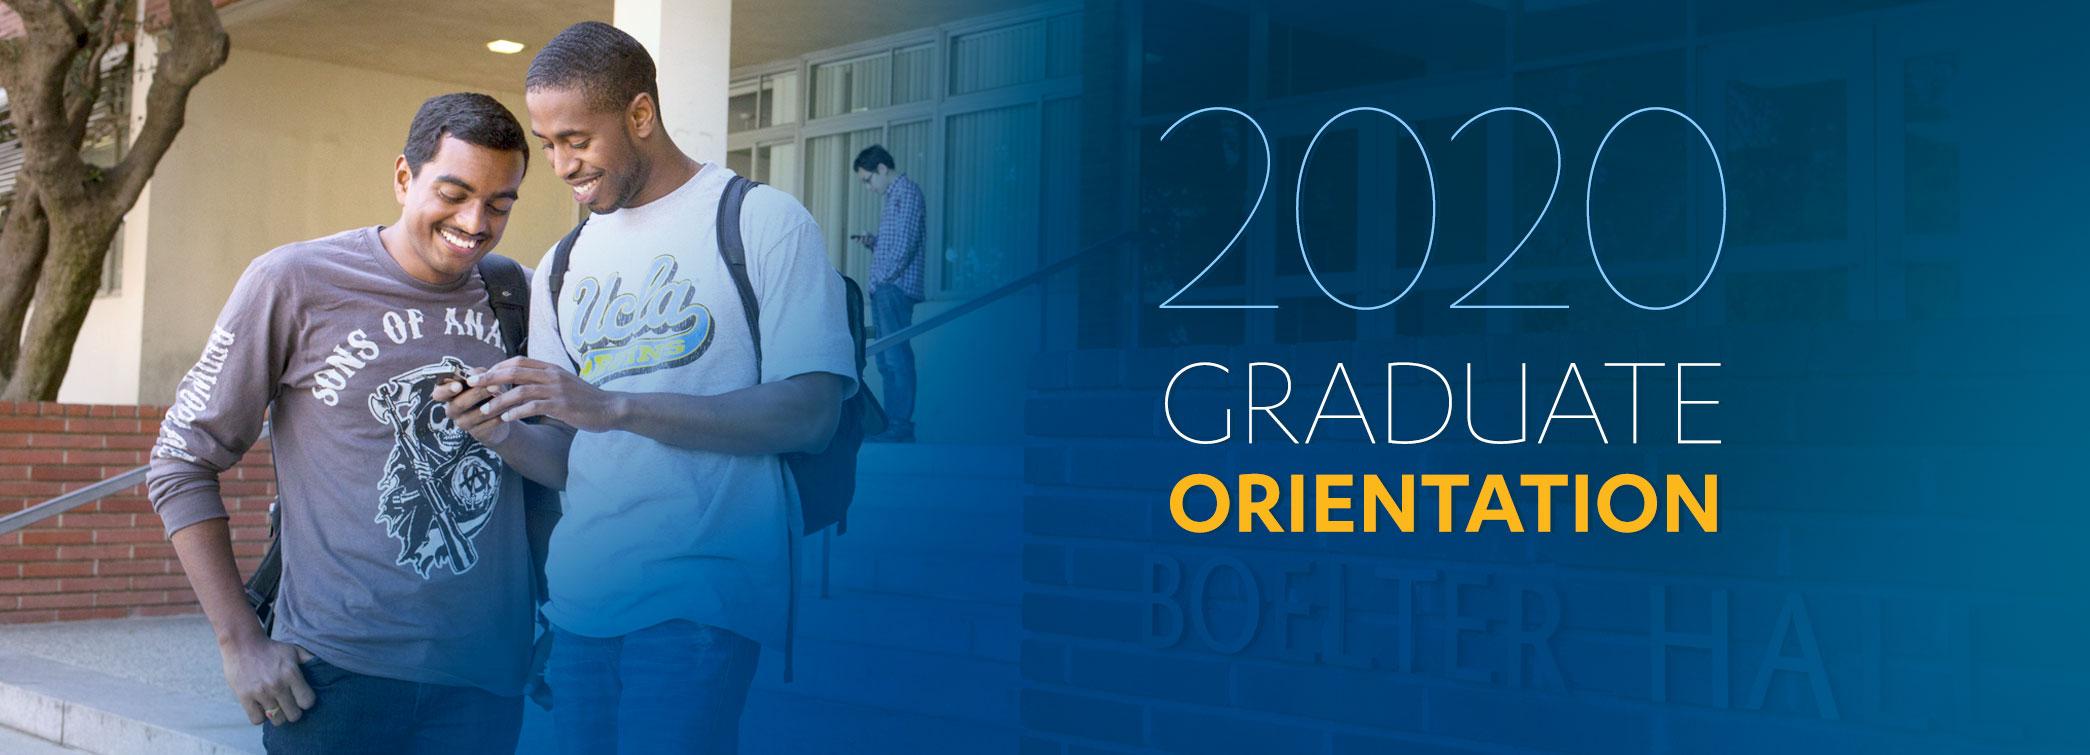 2020 Graduate Orientation Hero Imageg